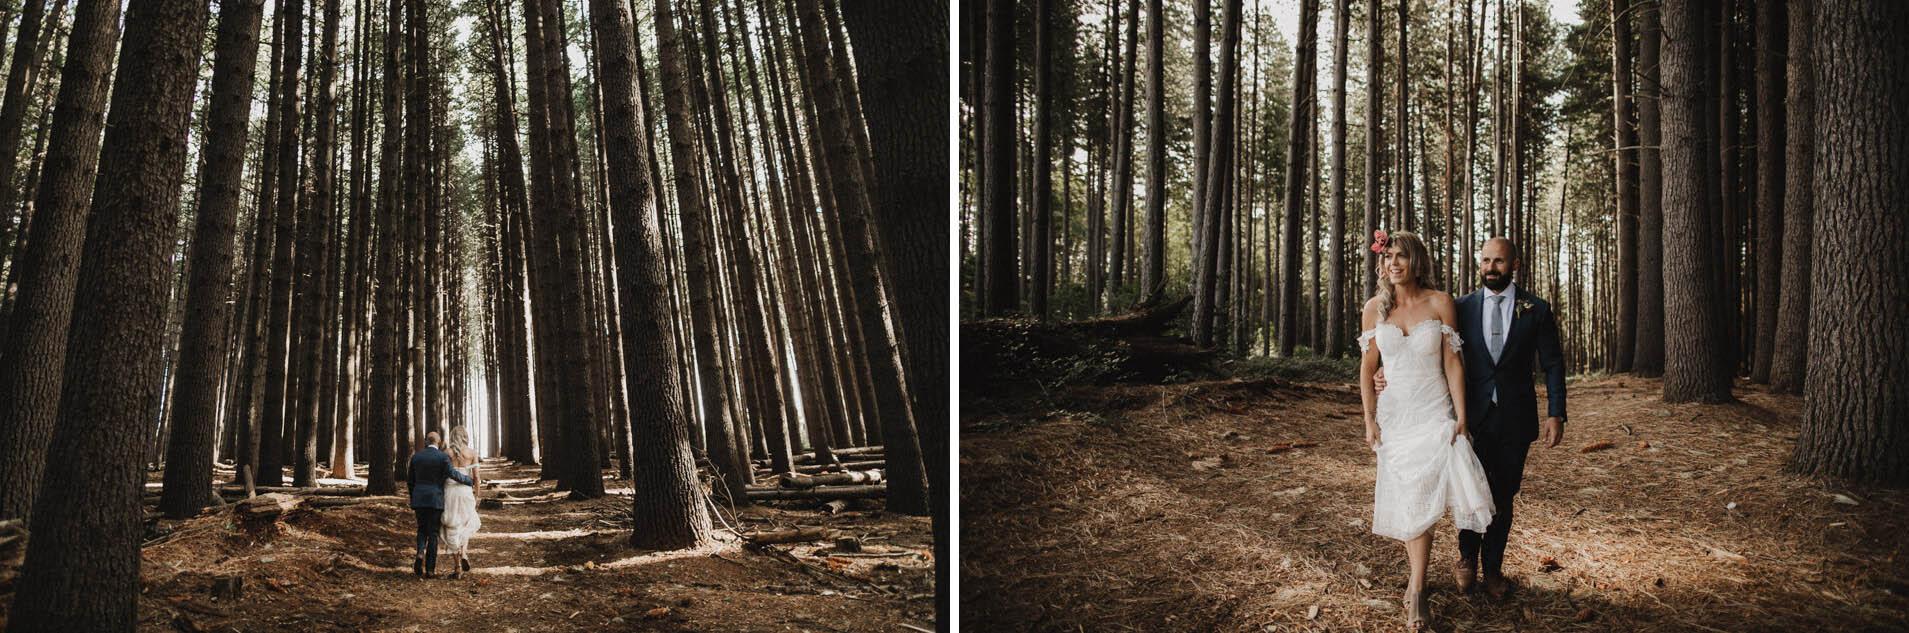 suger-pine-walk-wedding (Corinna & Dylan)_173(2210)2.jpg